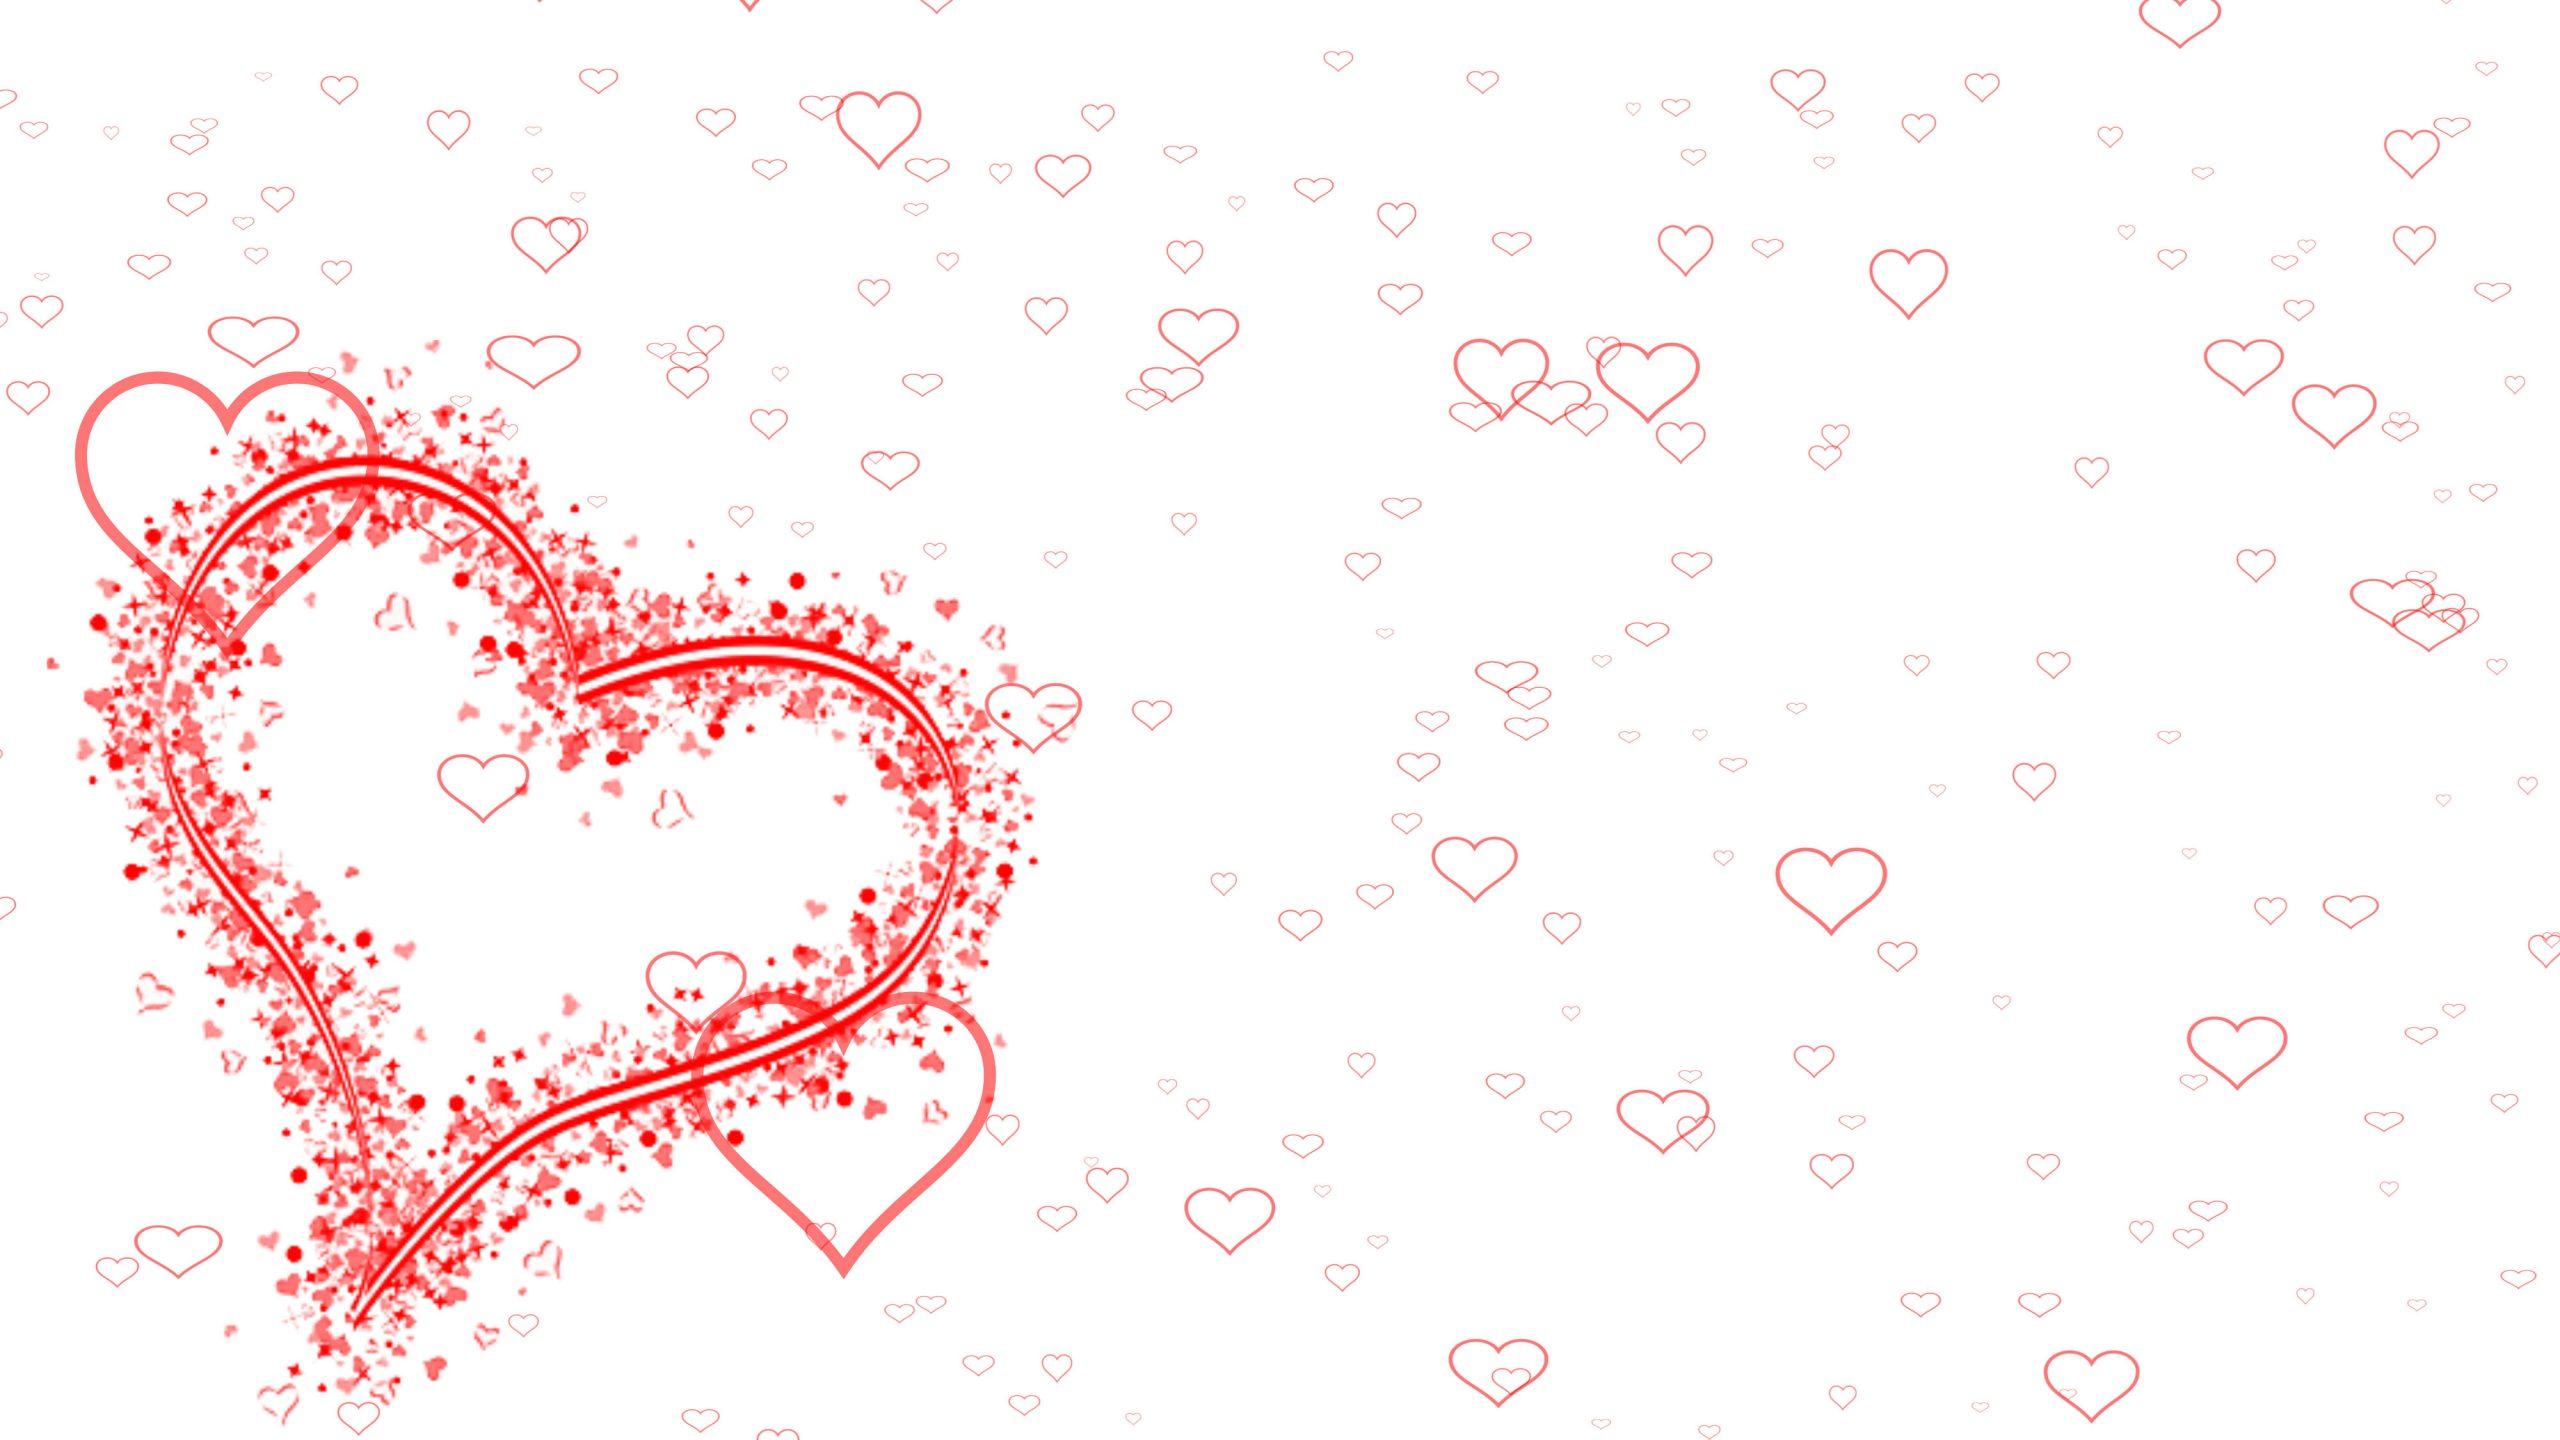 heart-illustration-background